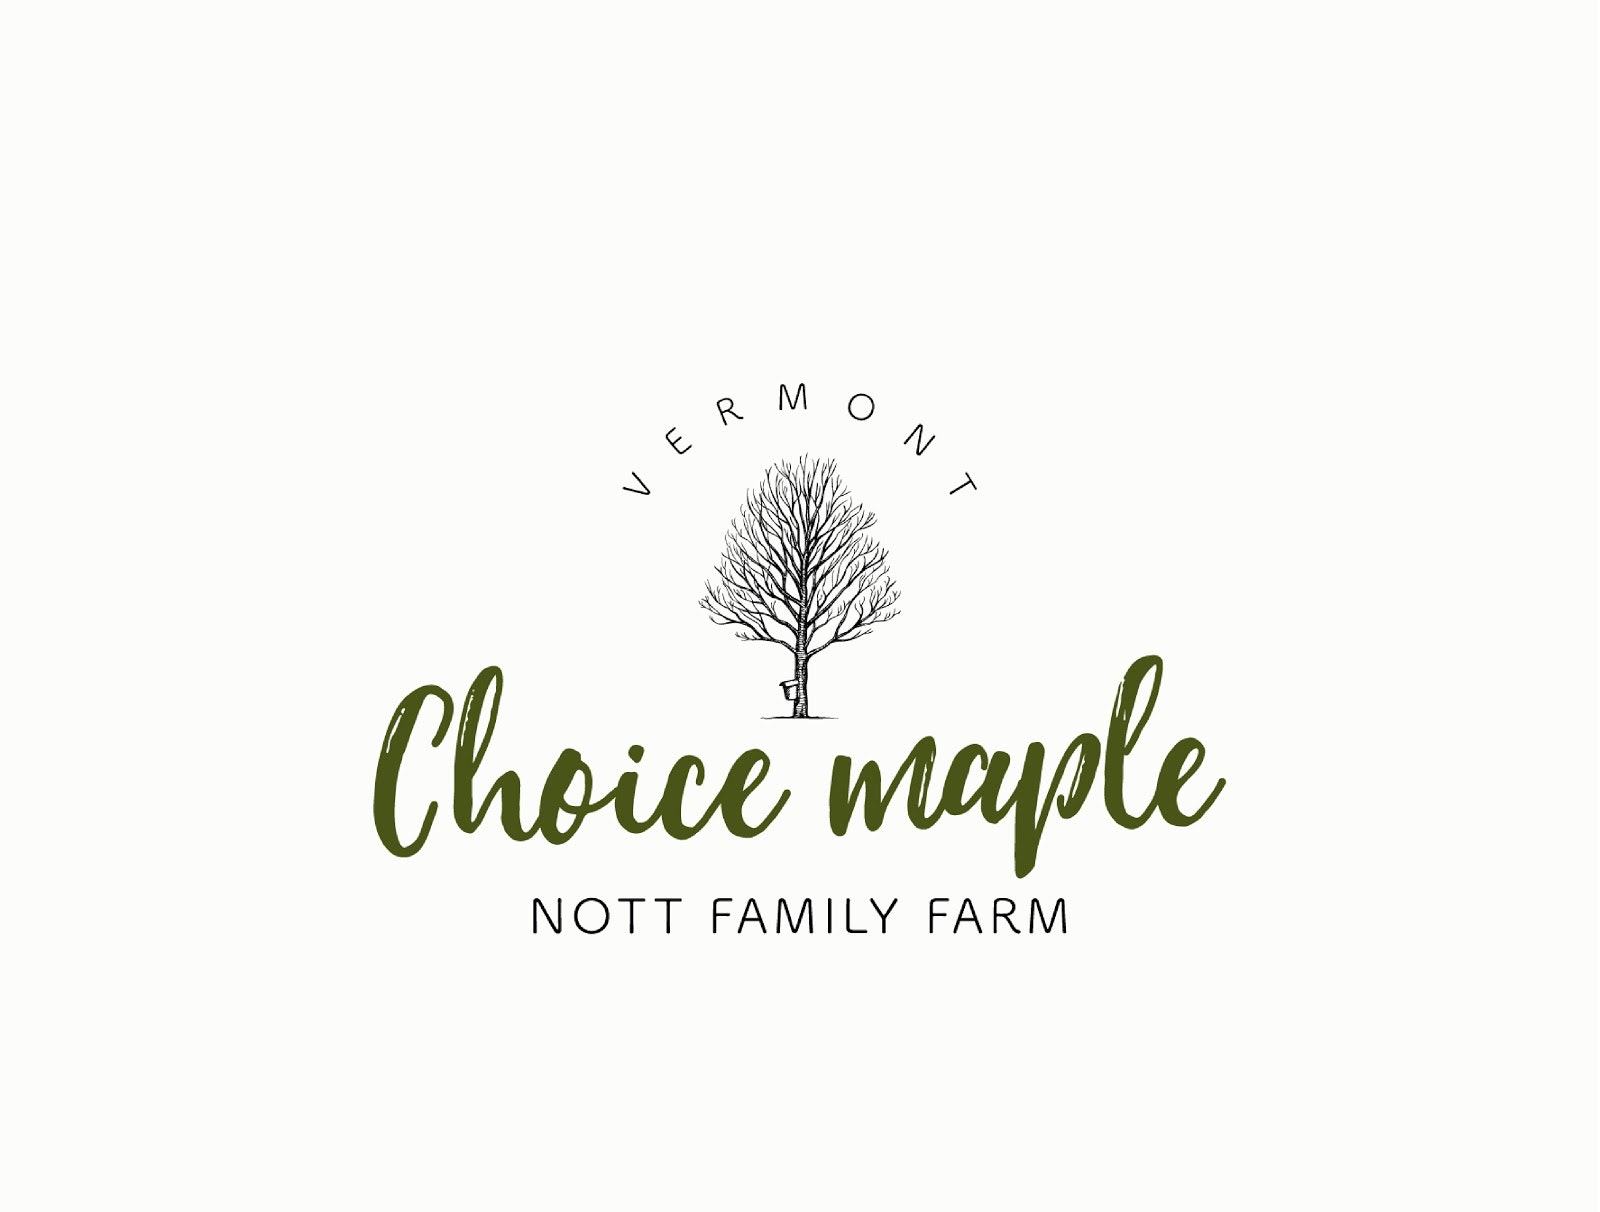 Choice Maple Nott family Farm